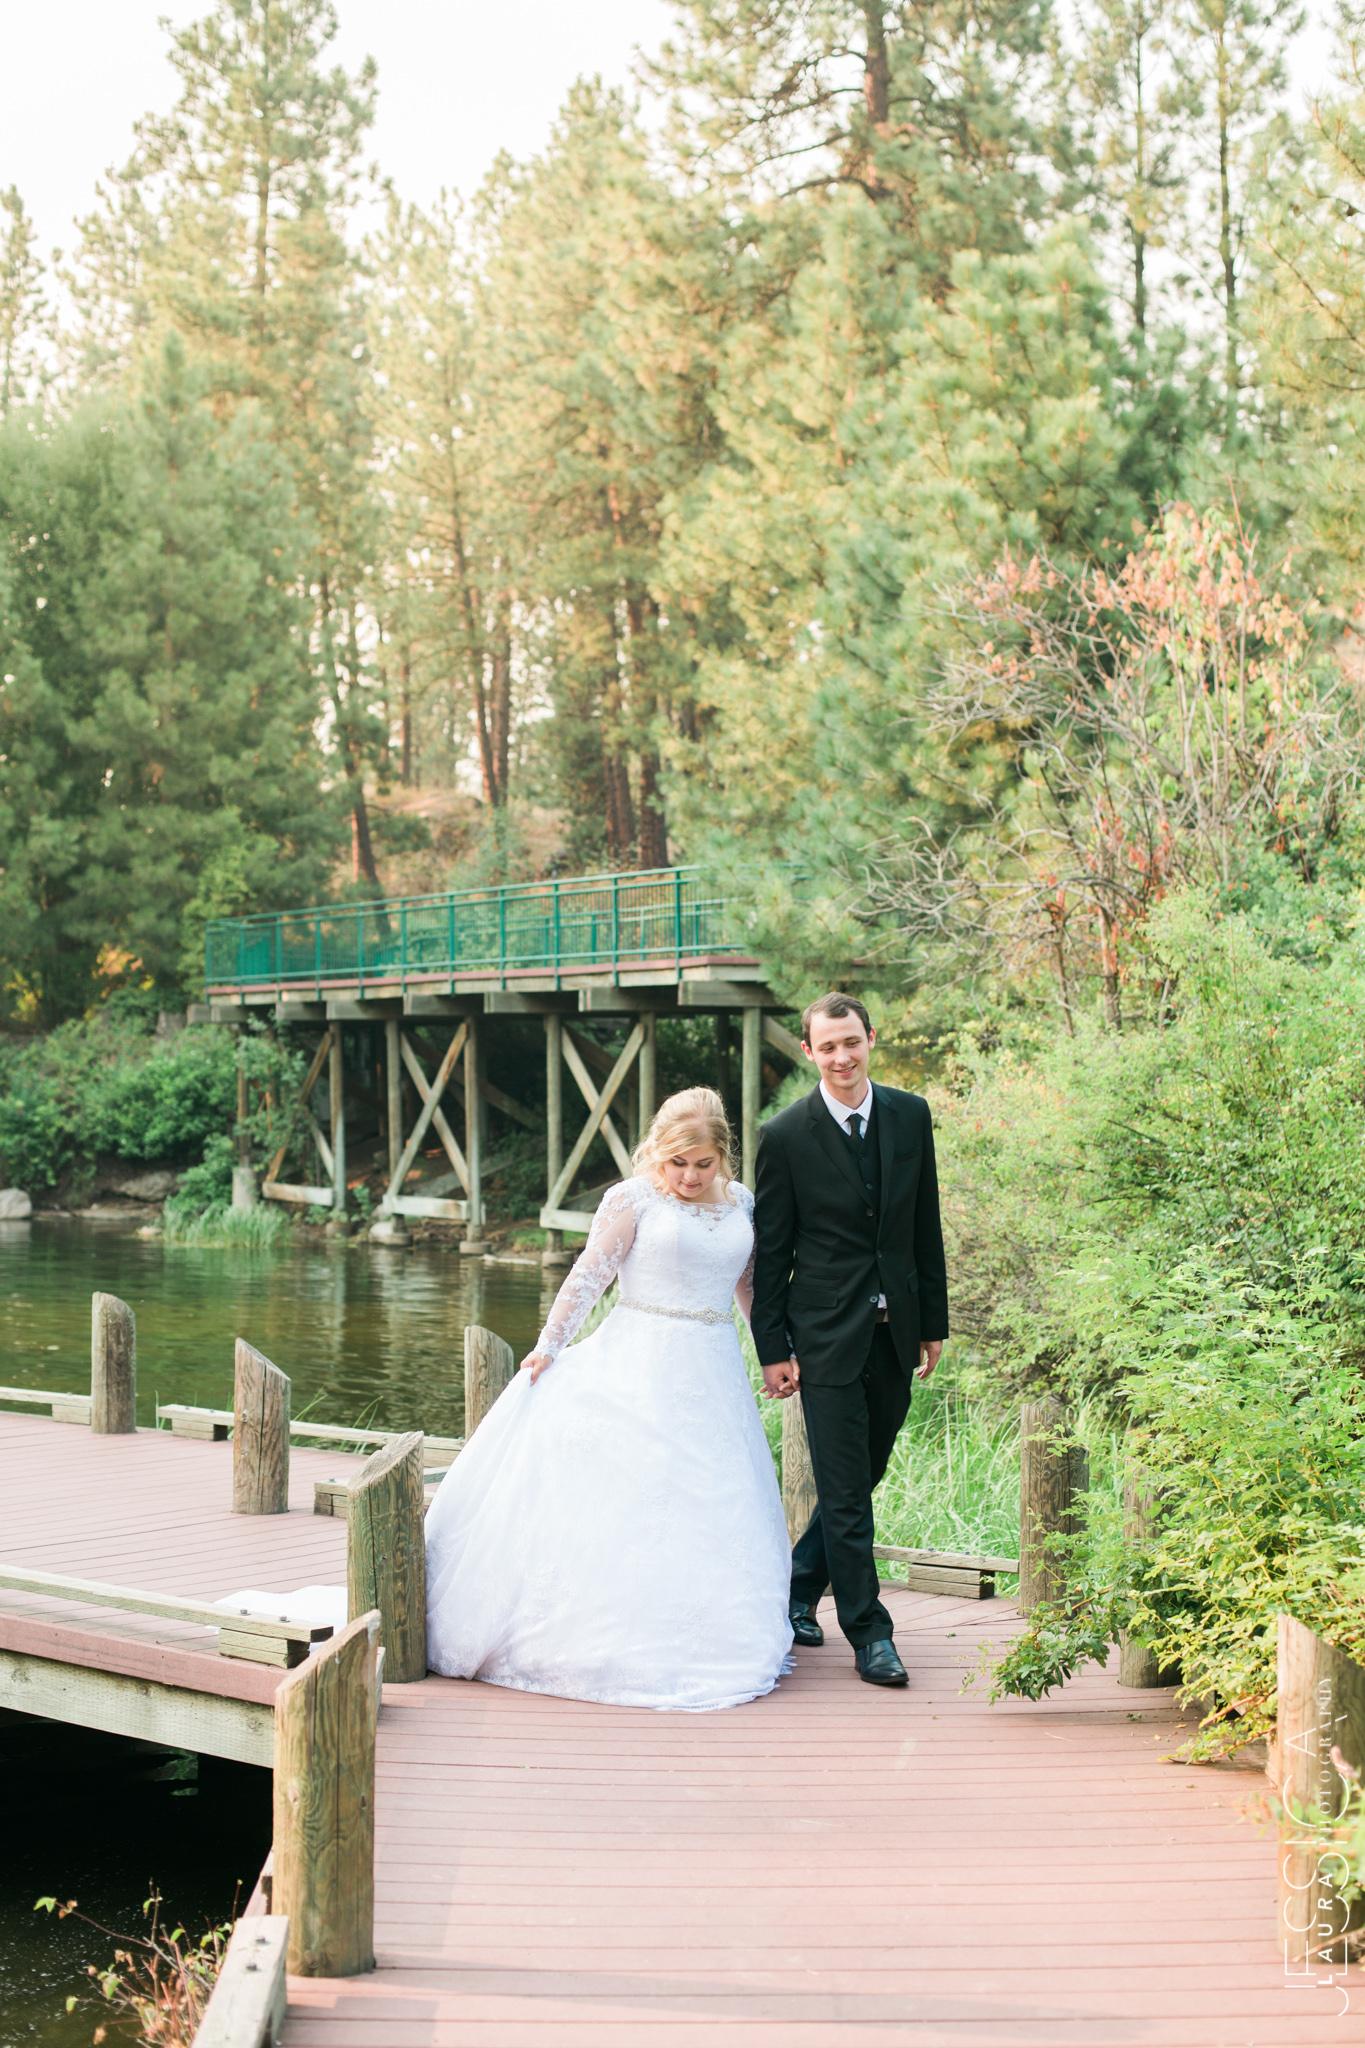 Eugene-Maryana_wedding_08062017_web (558 of 558).JPG